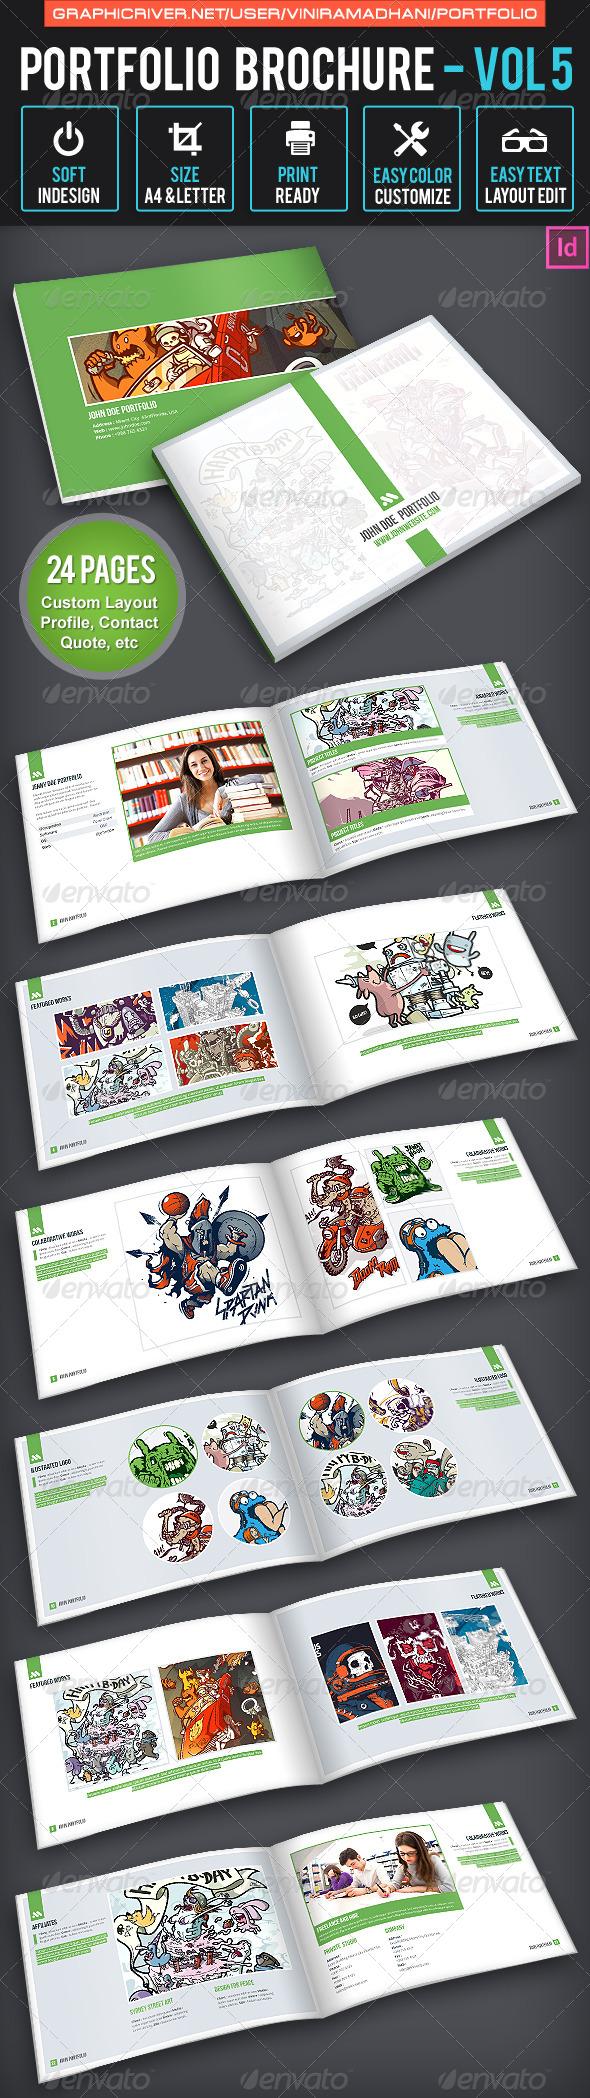 GraphicRiver Portfolio Brochure Volume 5 7658221